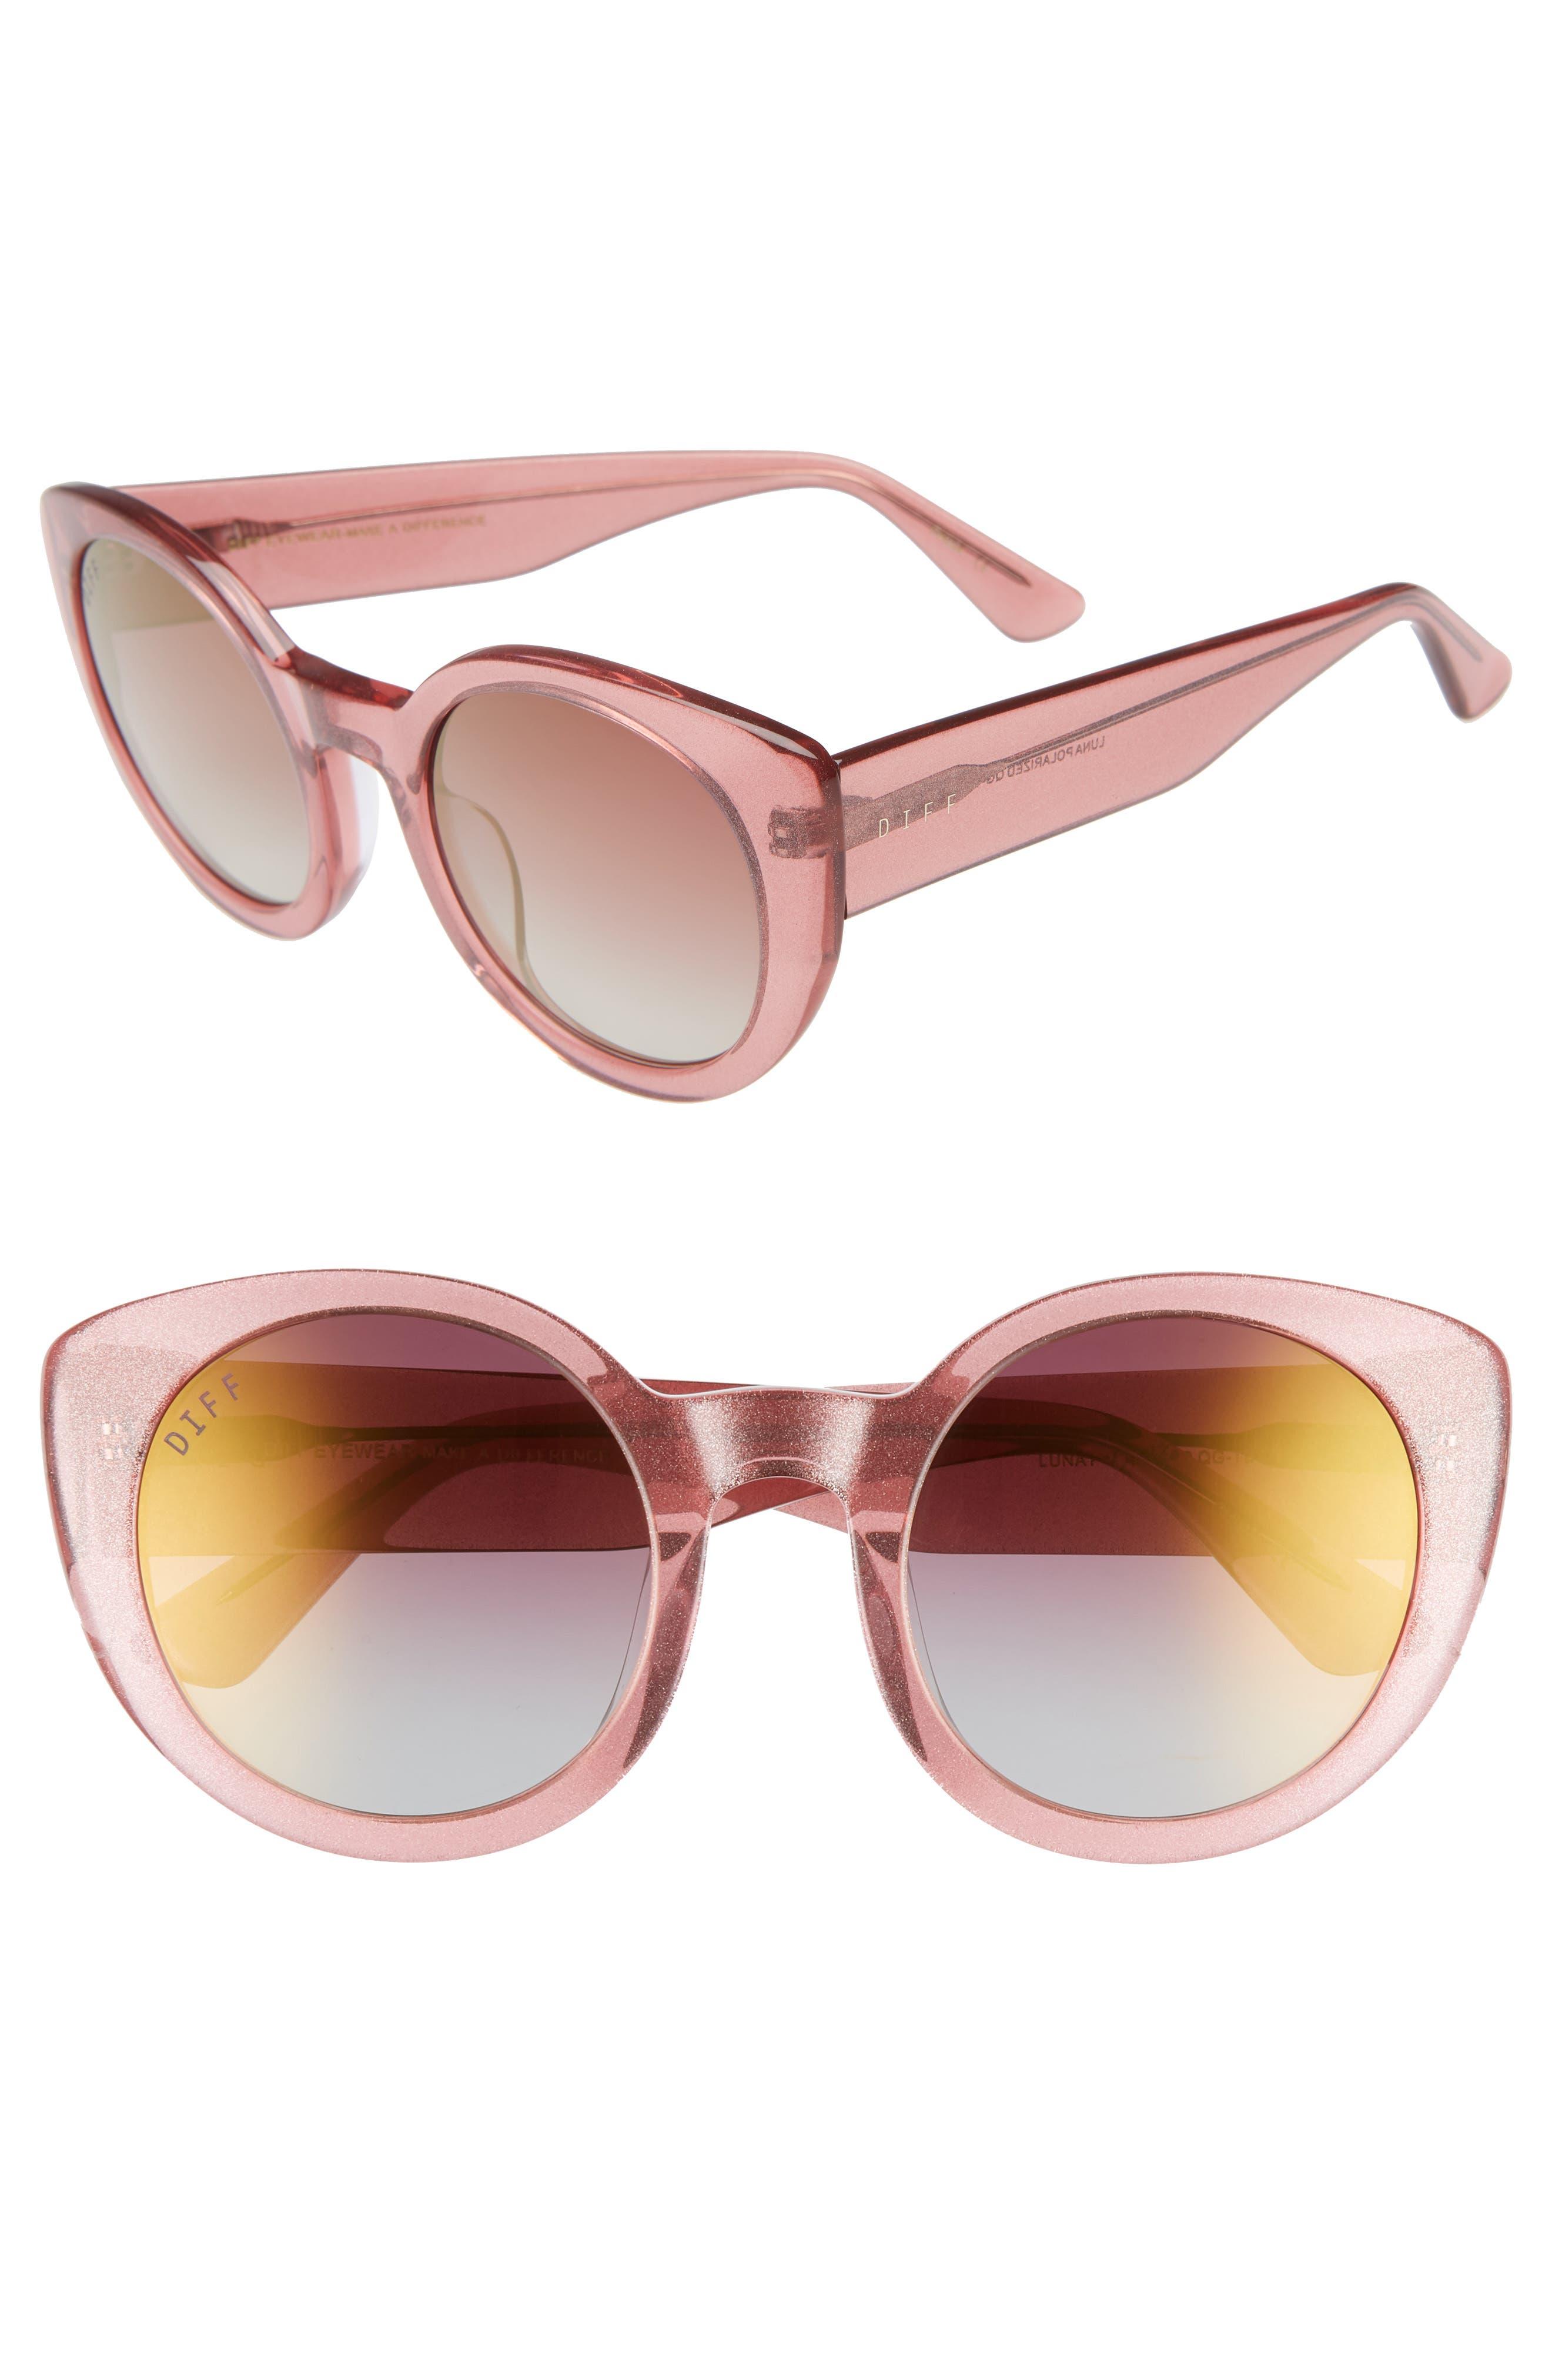 Diff Luna 5m Polarized Round Sunglasses - Quartz Glitter/ Rose